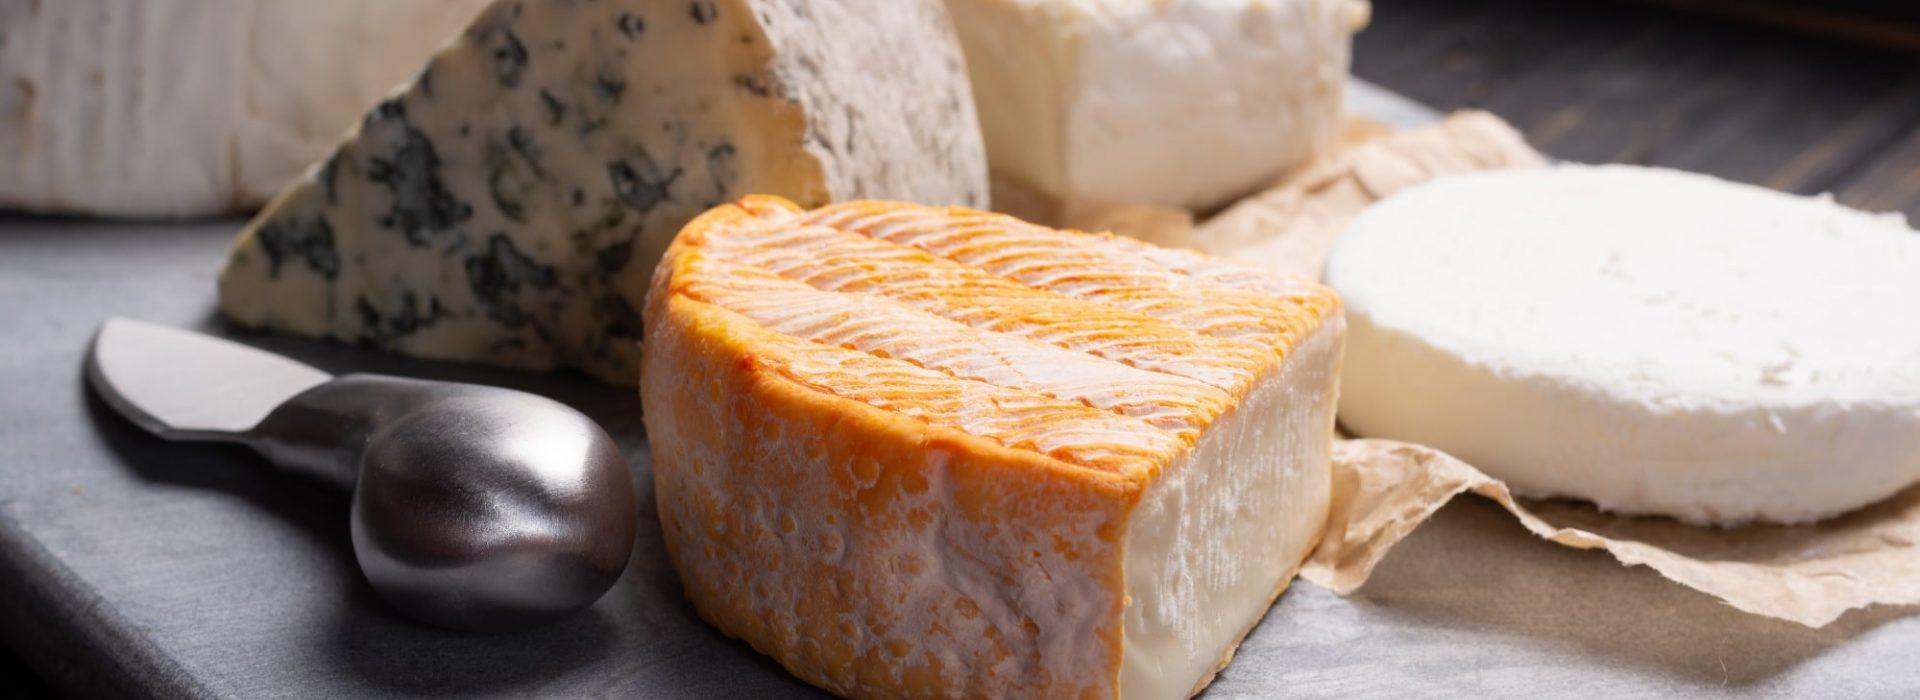 Cheese Platter Blog Image